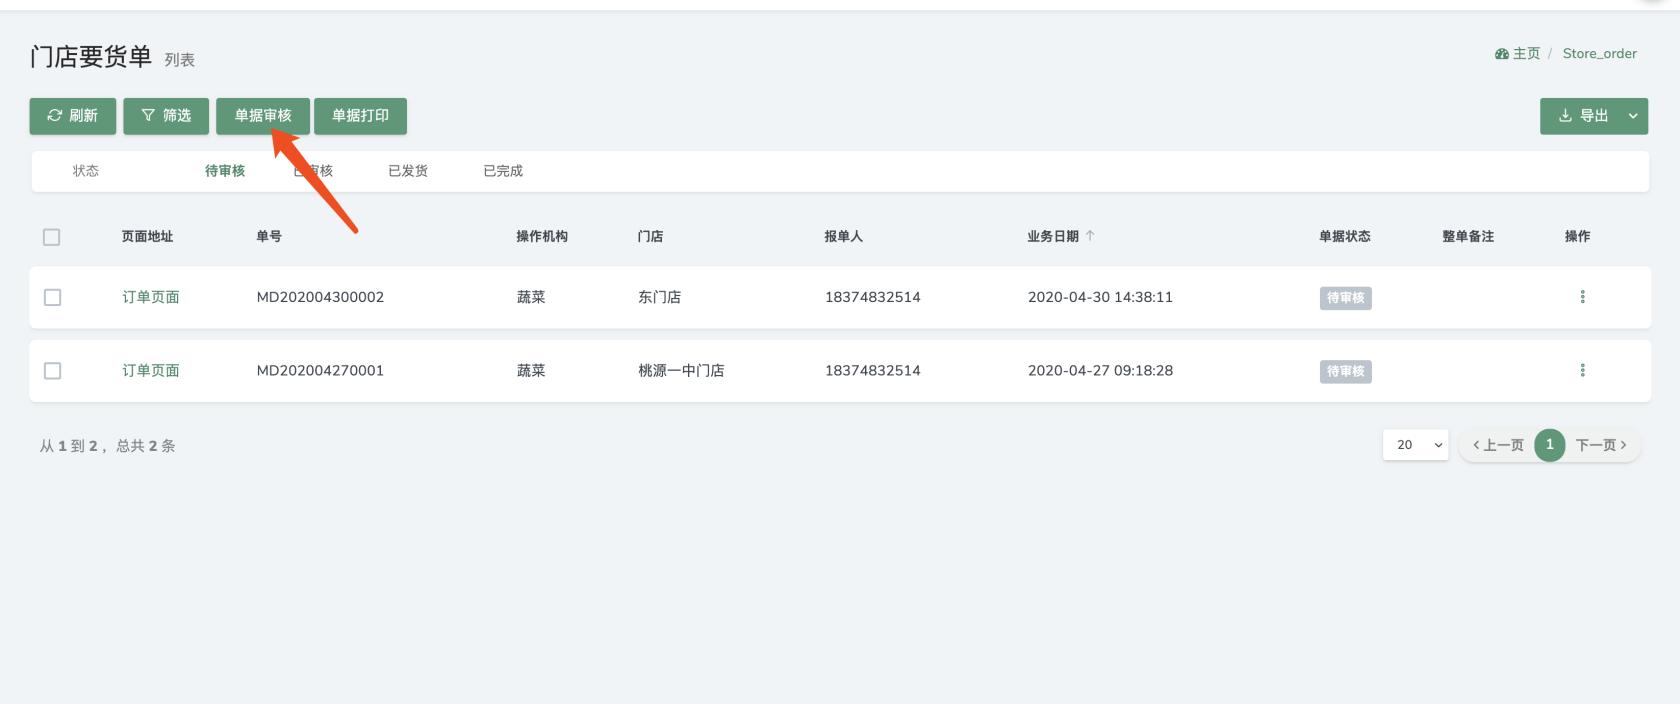 dcat-admin 开源框架在 erp 项目中的应用